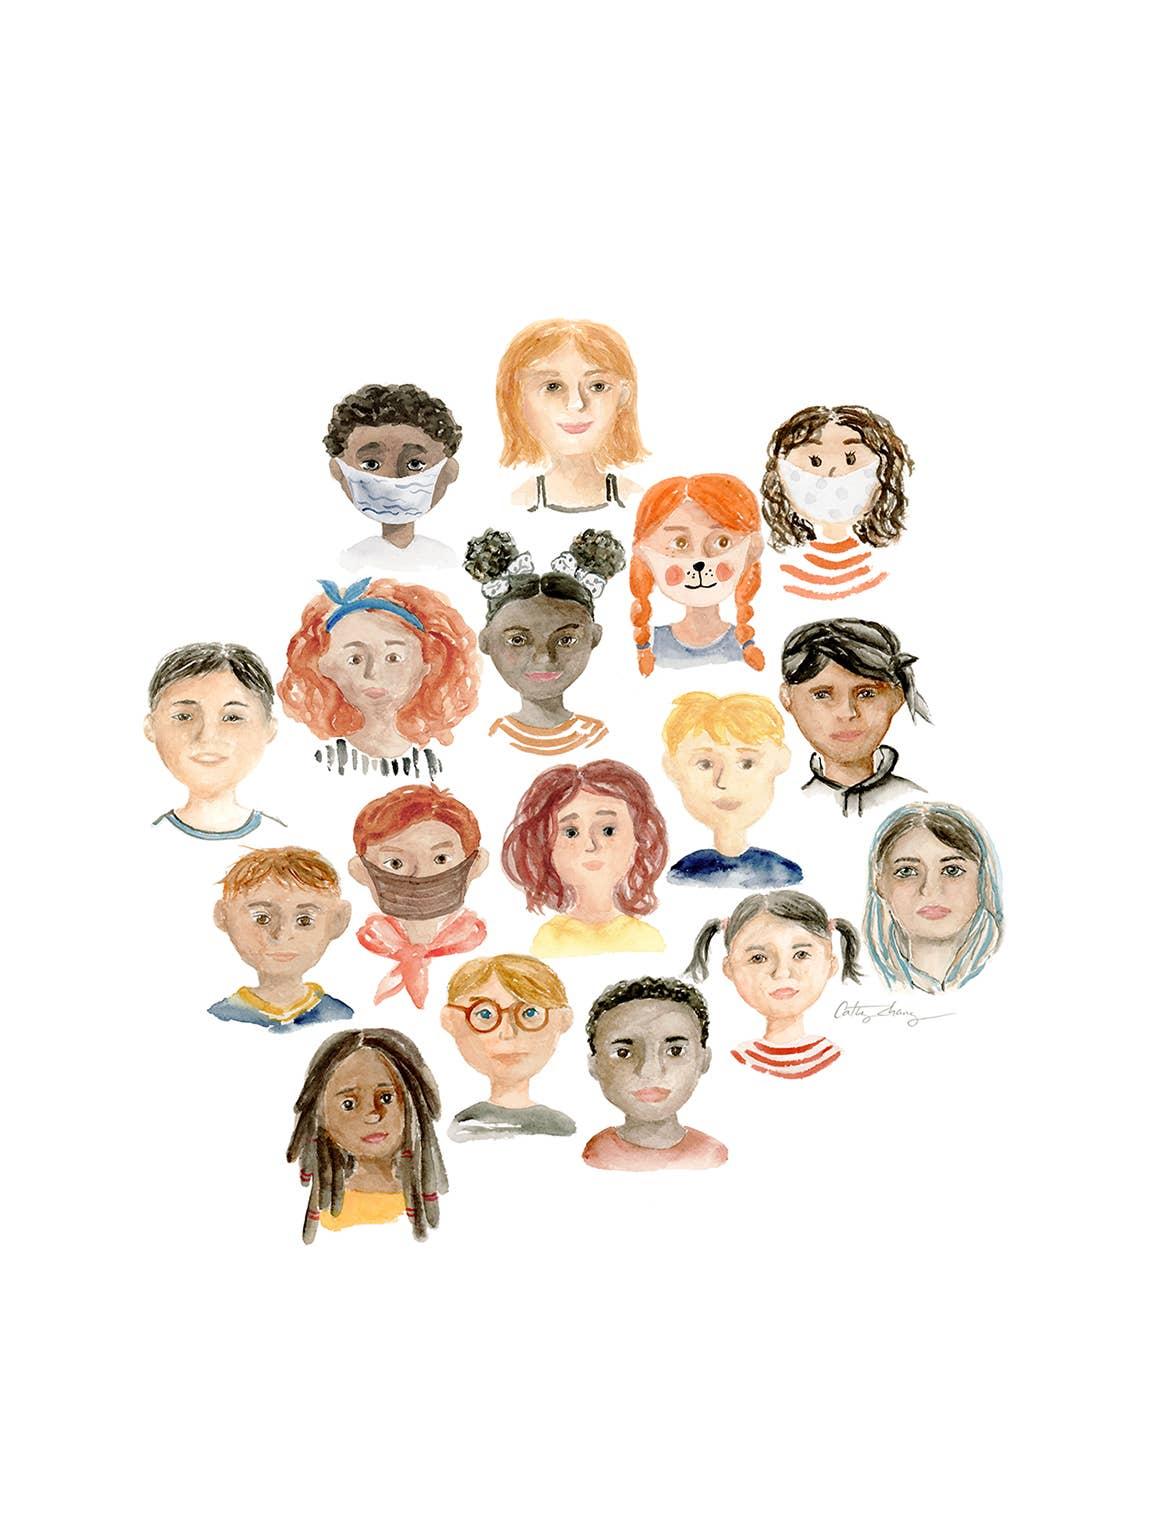 We Are One Human Race - Diversity Art Print | Trada Marketplace